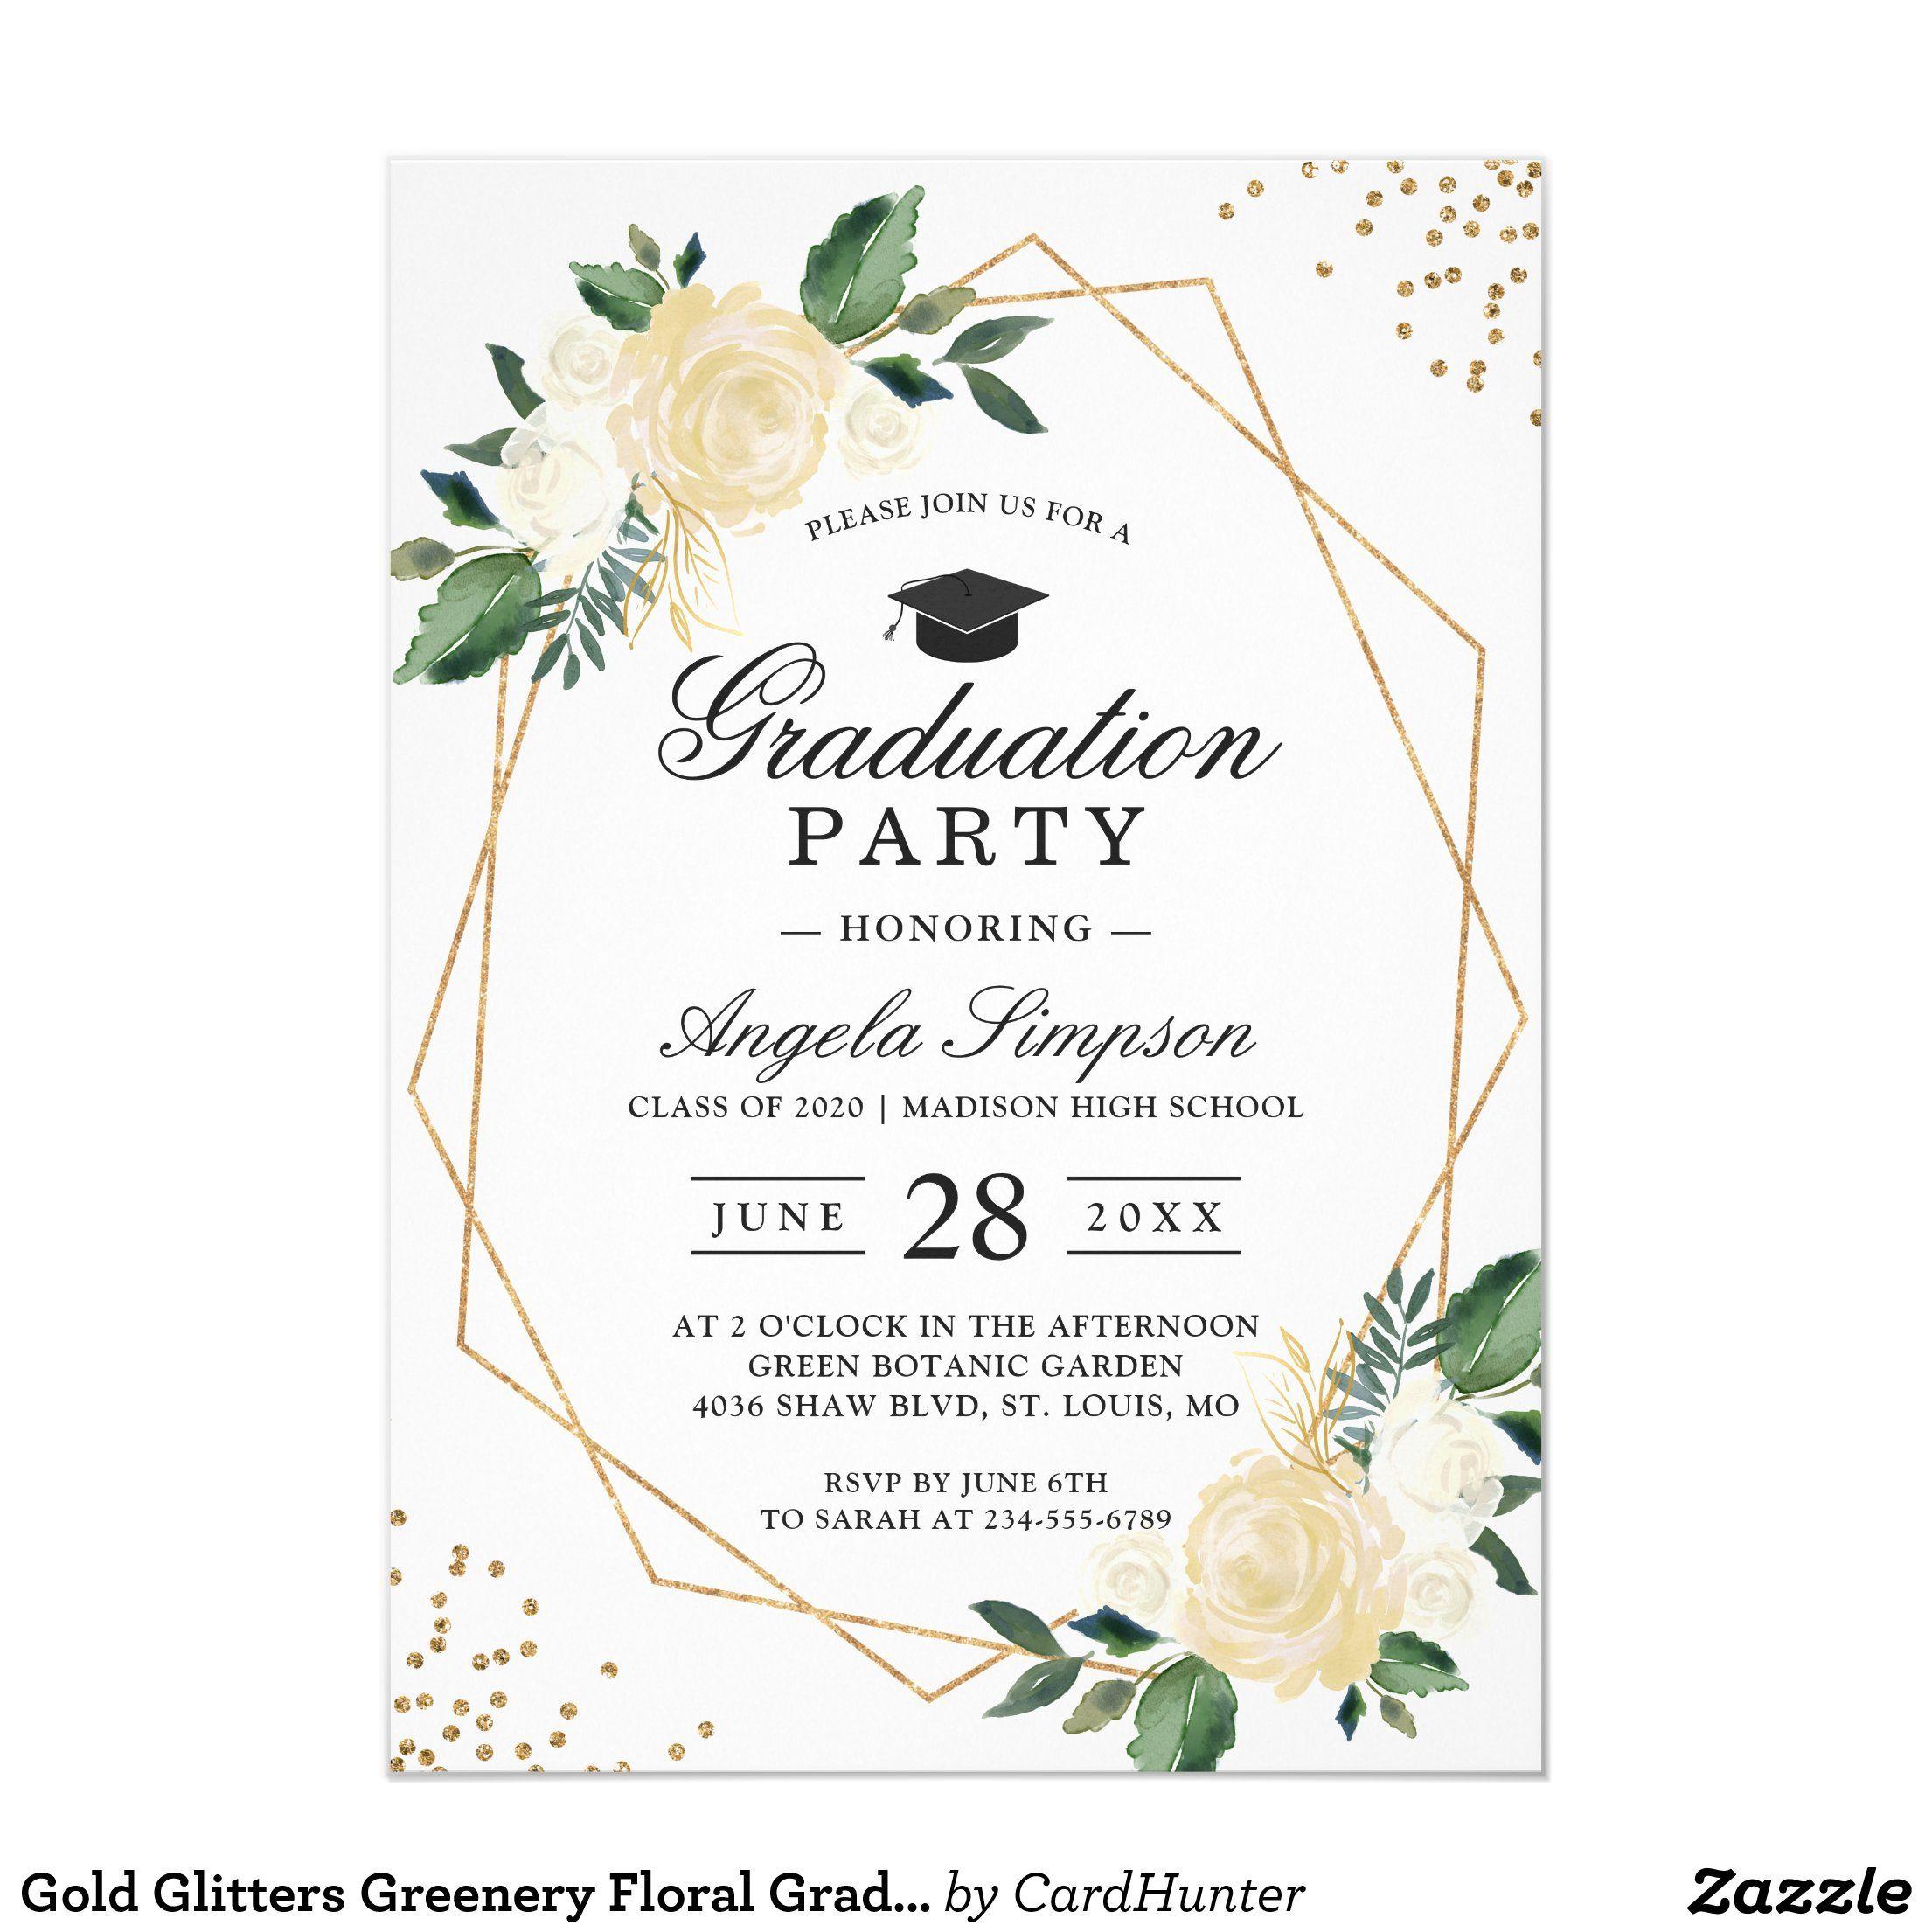 Photo of Gold Glitters Greenery Floral Graduation Party Invitation | Zazzle.com